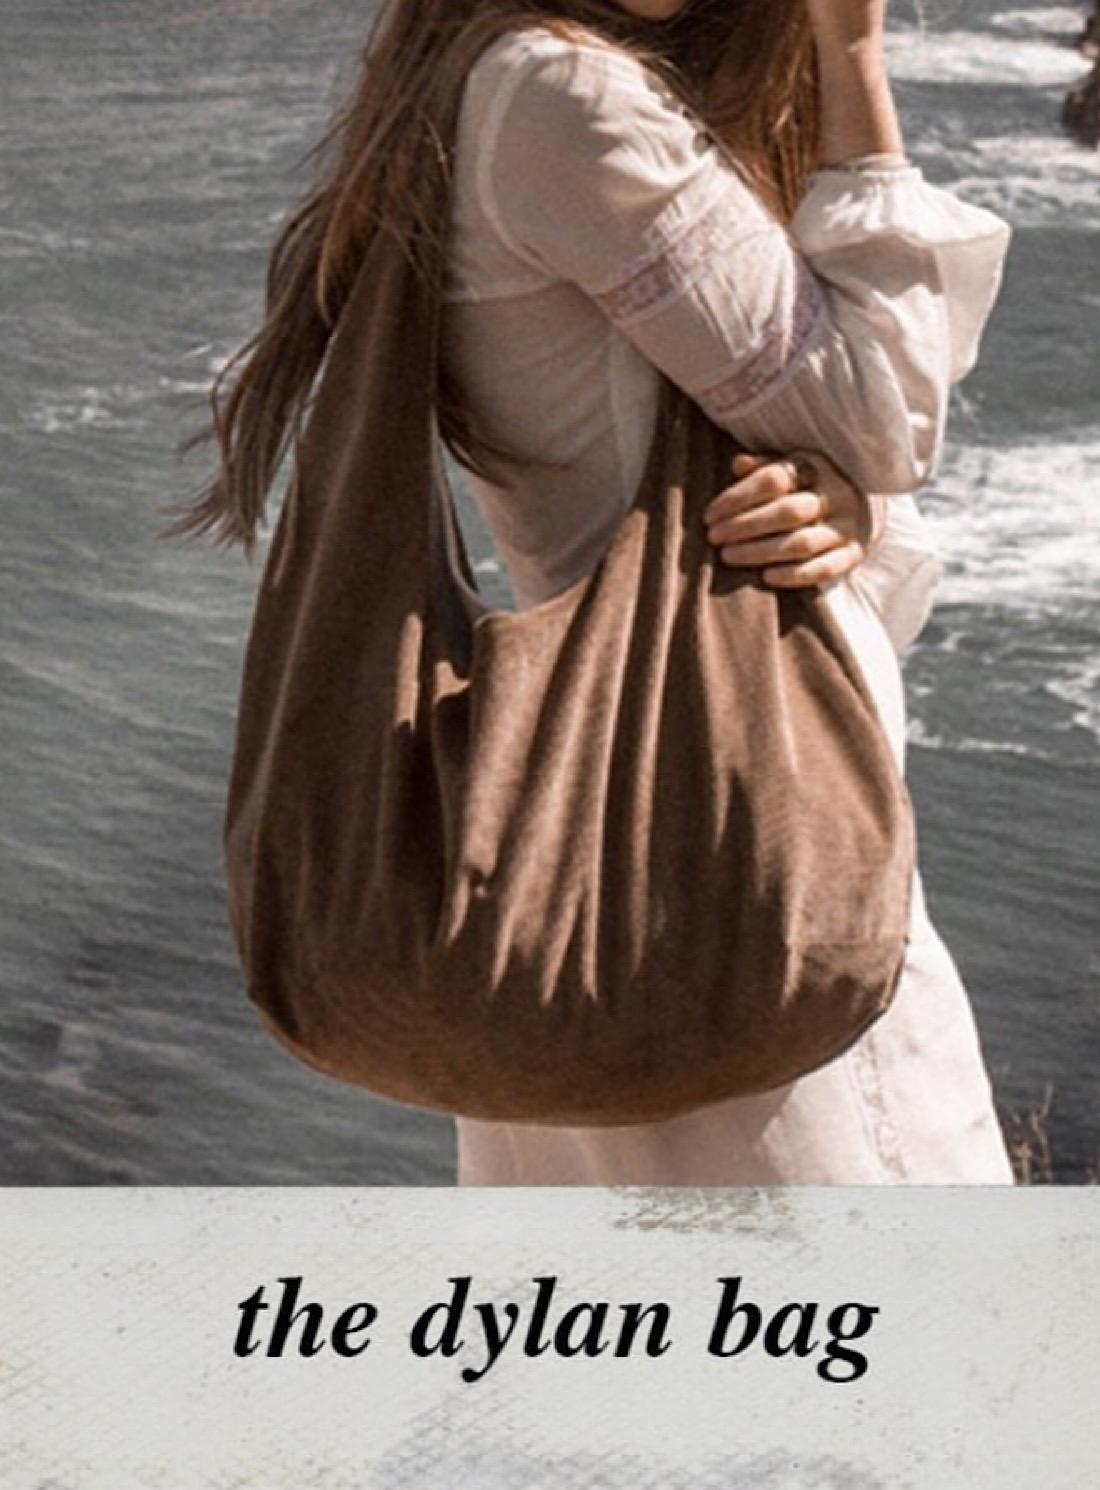 DYLAN VEGAN BAG in Camel - Last one by Zephyr